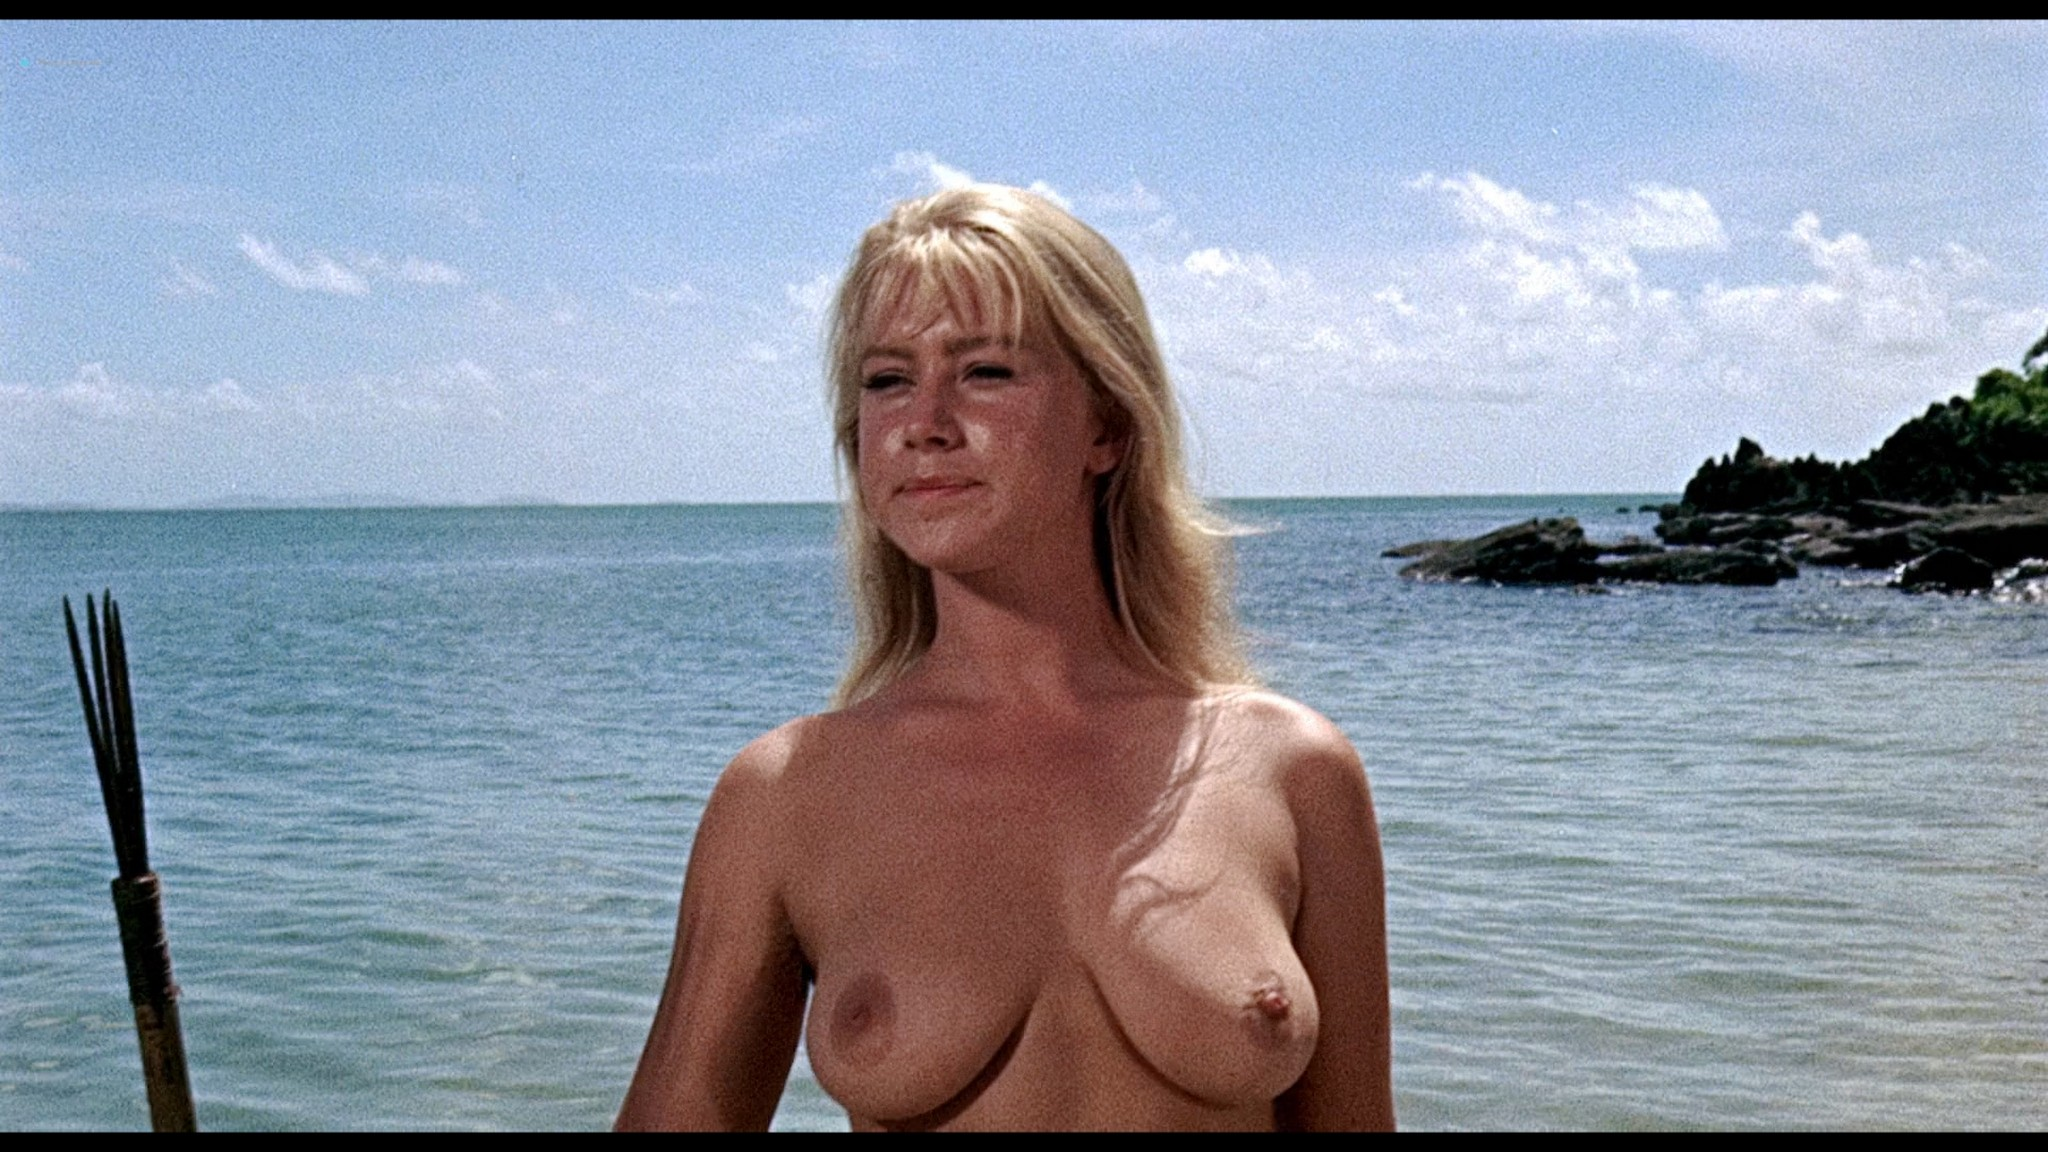 Helen Mirren nude skinny dipping Clarissa Kaye-Mason nude sex - Age of Consent (1969) HD 1080p BluRay Remux (4)